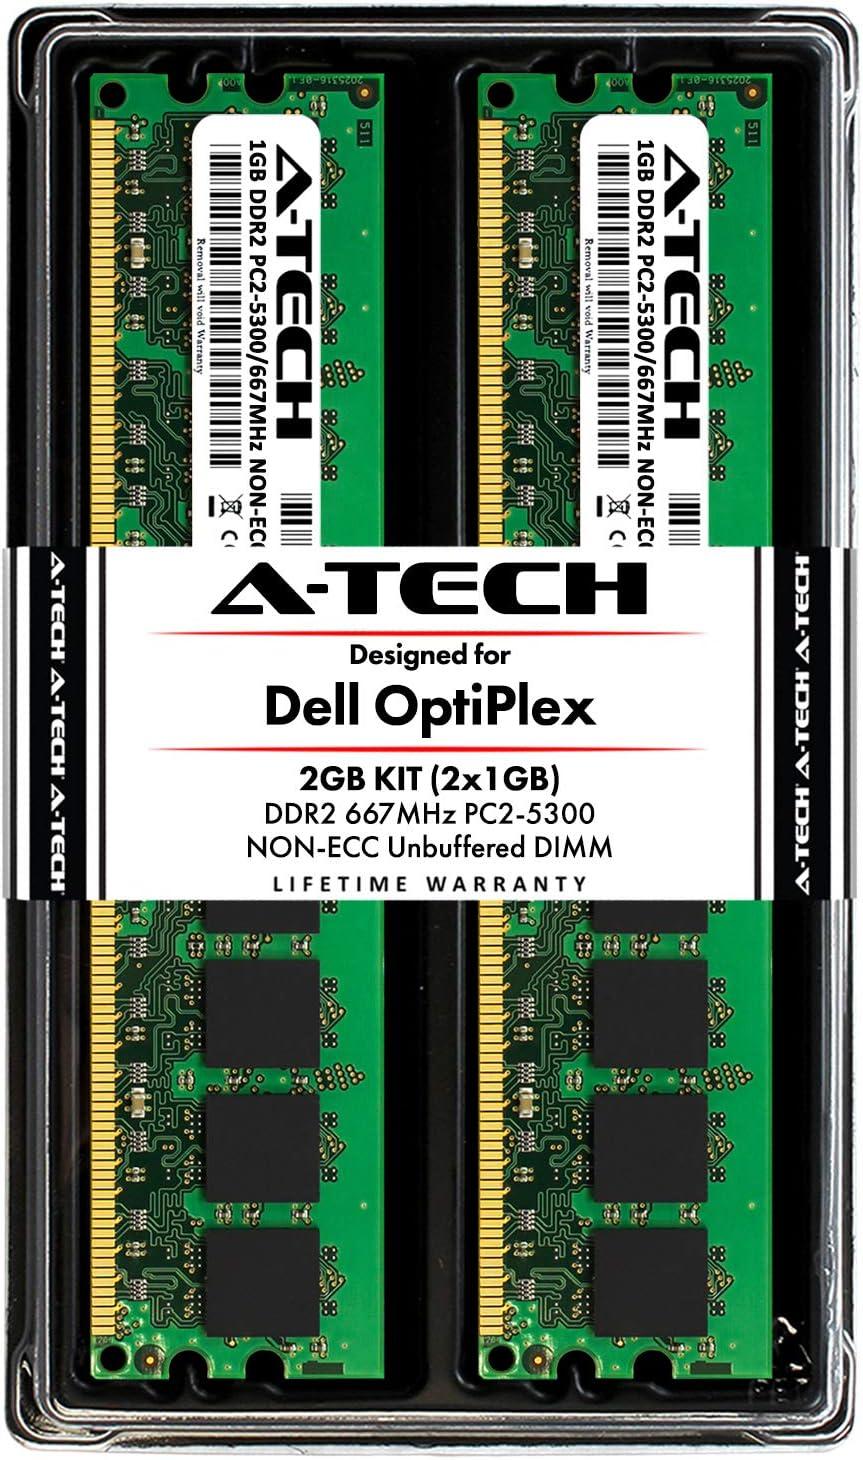 A-Tech 2GB (2X 1GB) Memory RAM Kit for Dell OptiPlex 755, 745, 740, GX620, GX520, 360, 330, 160, FX160, (MT, DT, SFF, USFF) - DDR2 667MHz PC2-5300 Non-ECC DIMM Modules